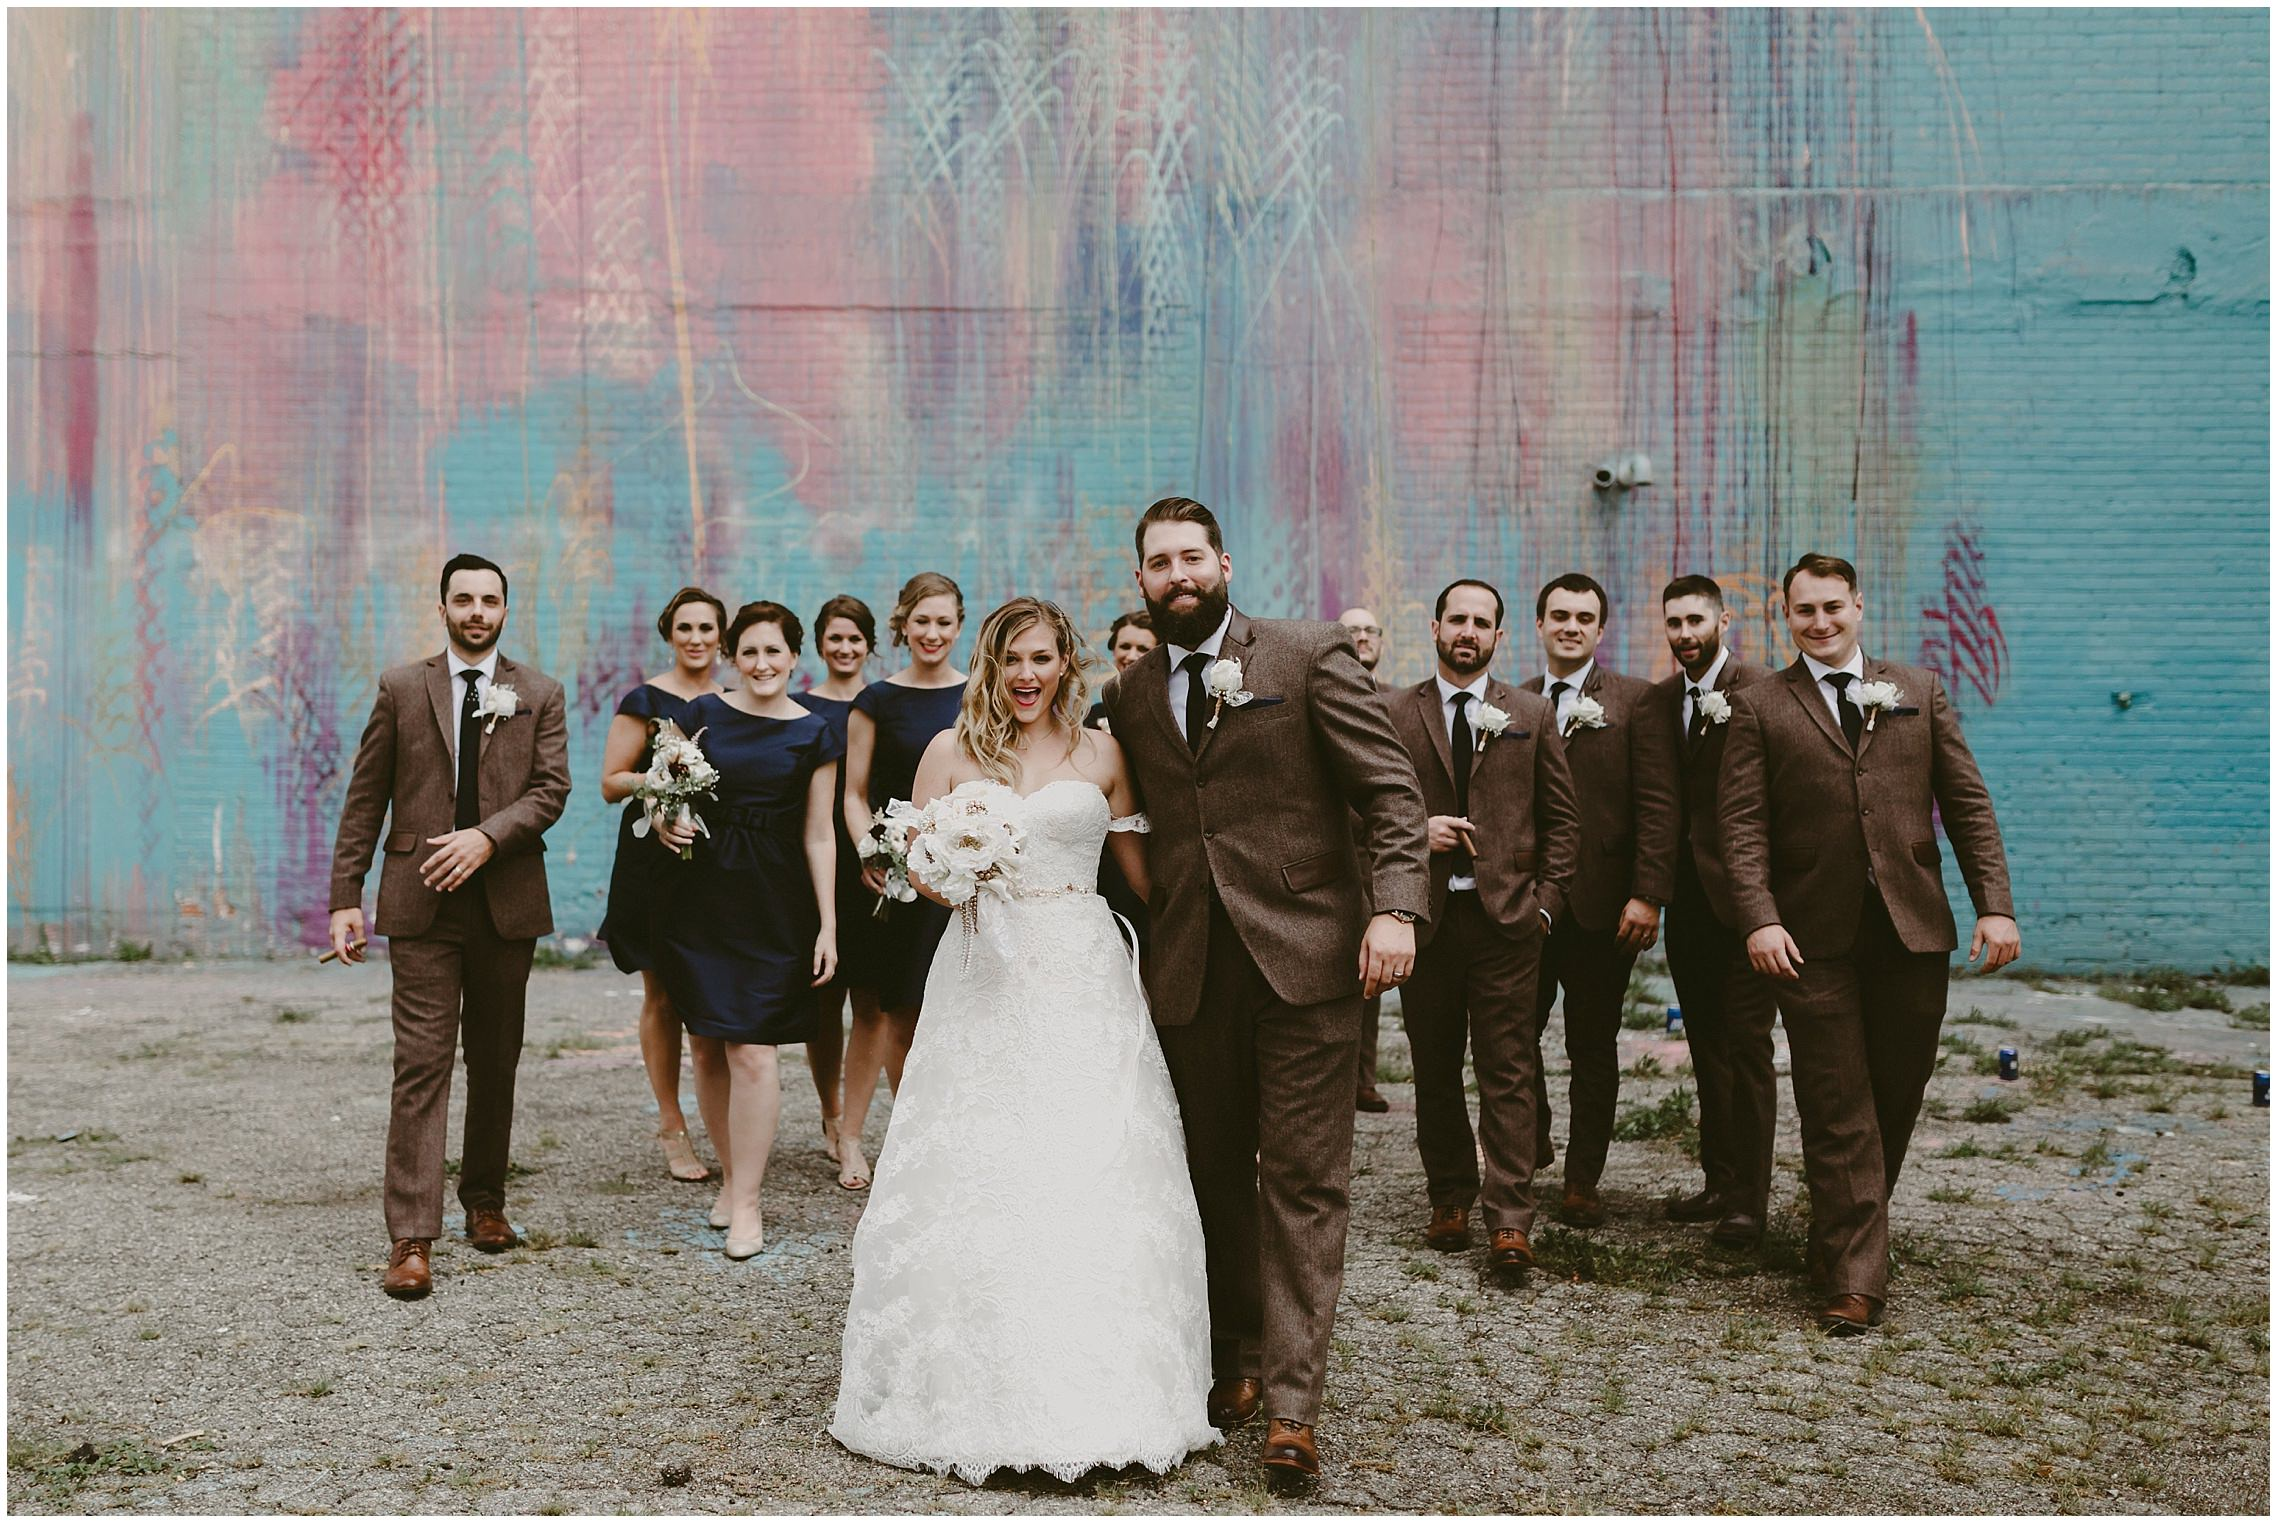 brick_and_mortar_colorado_wedding_photographer_0214.jpg